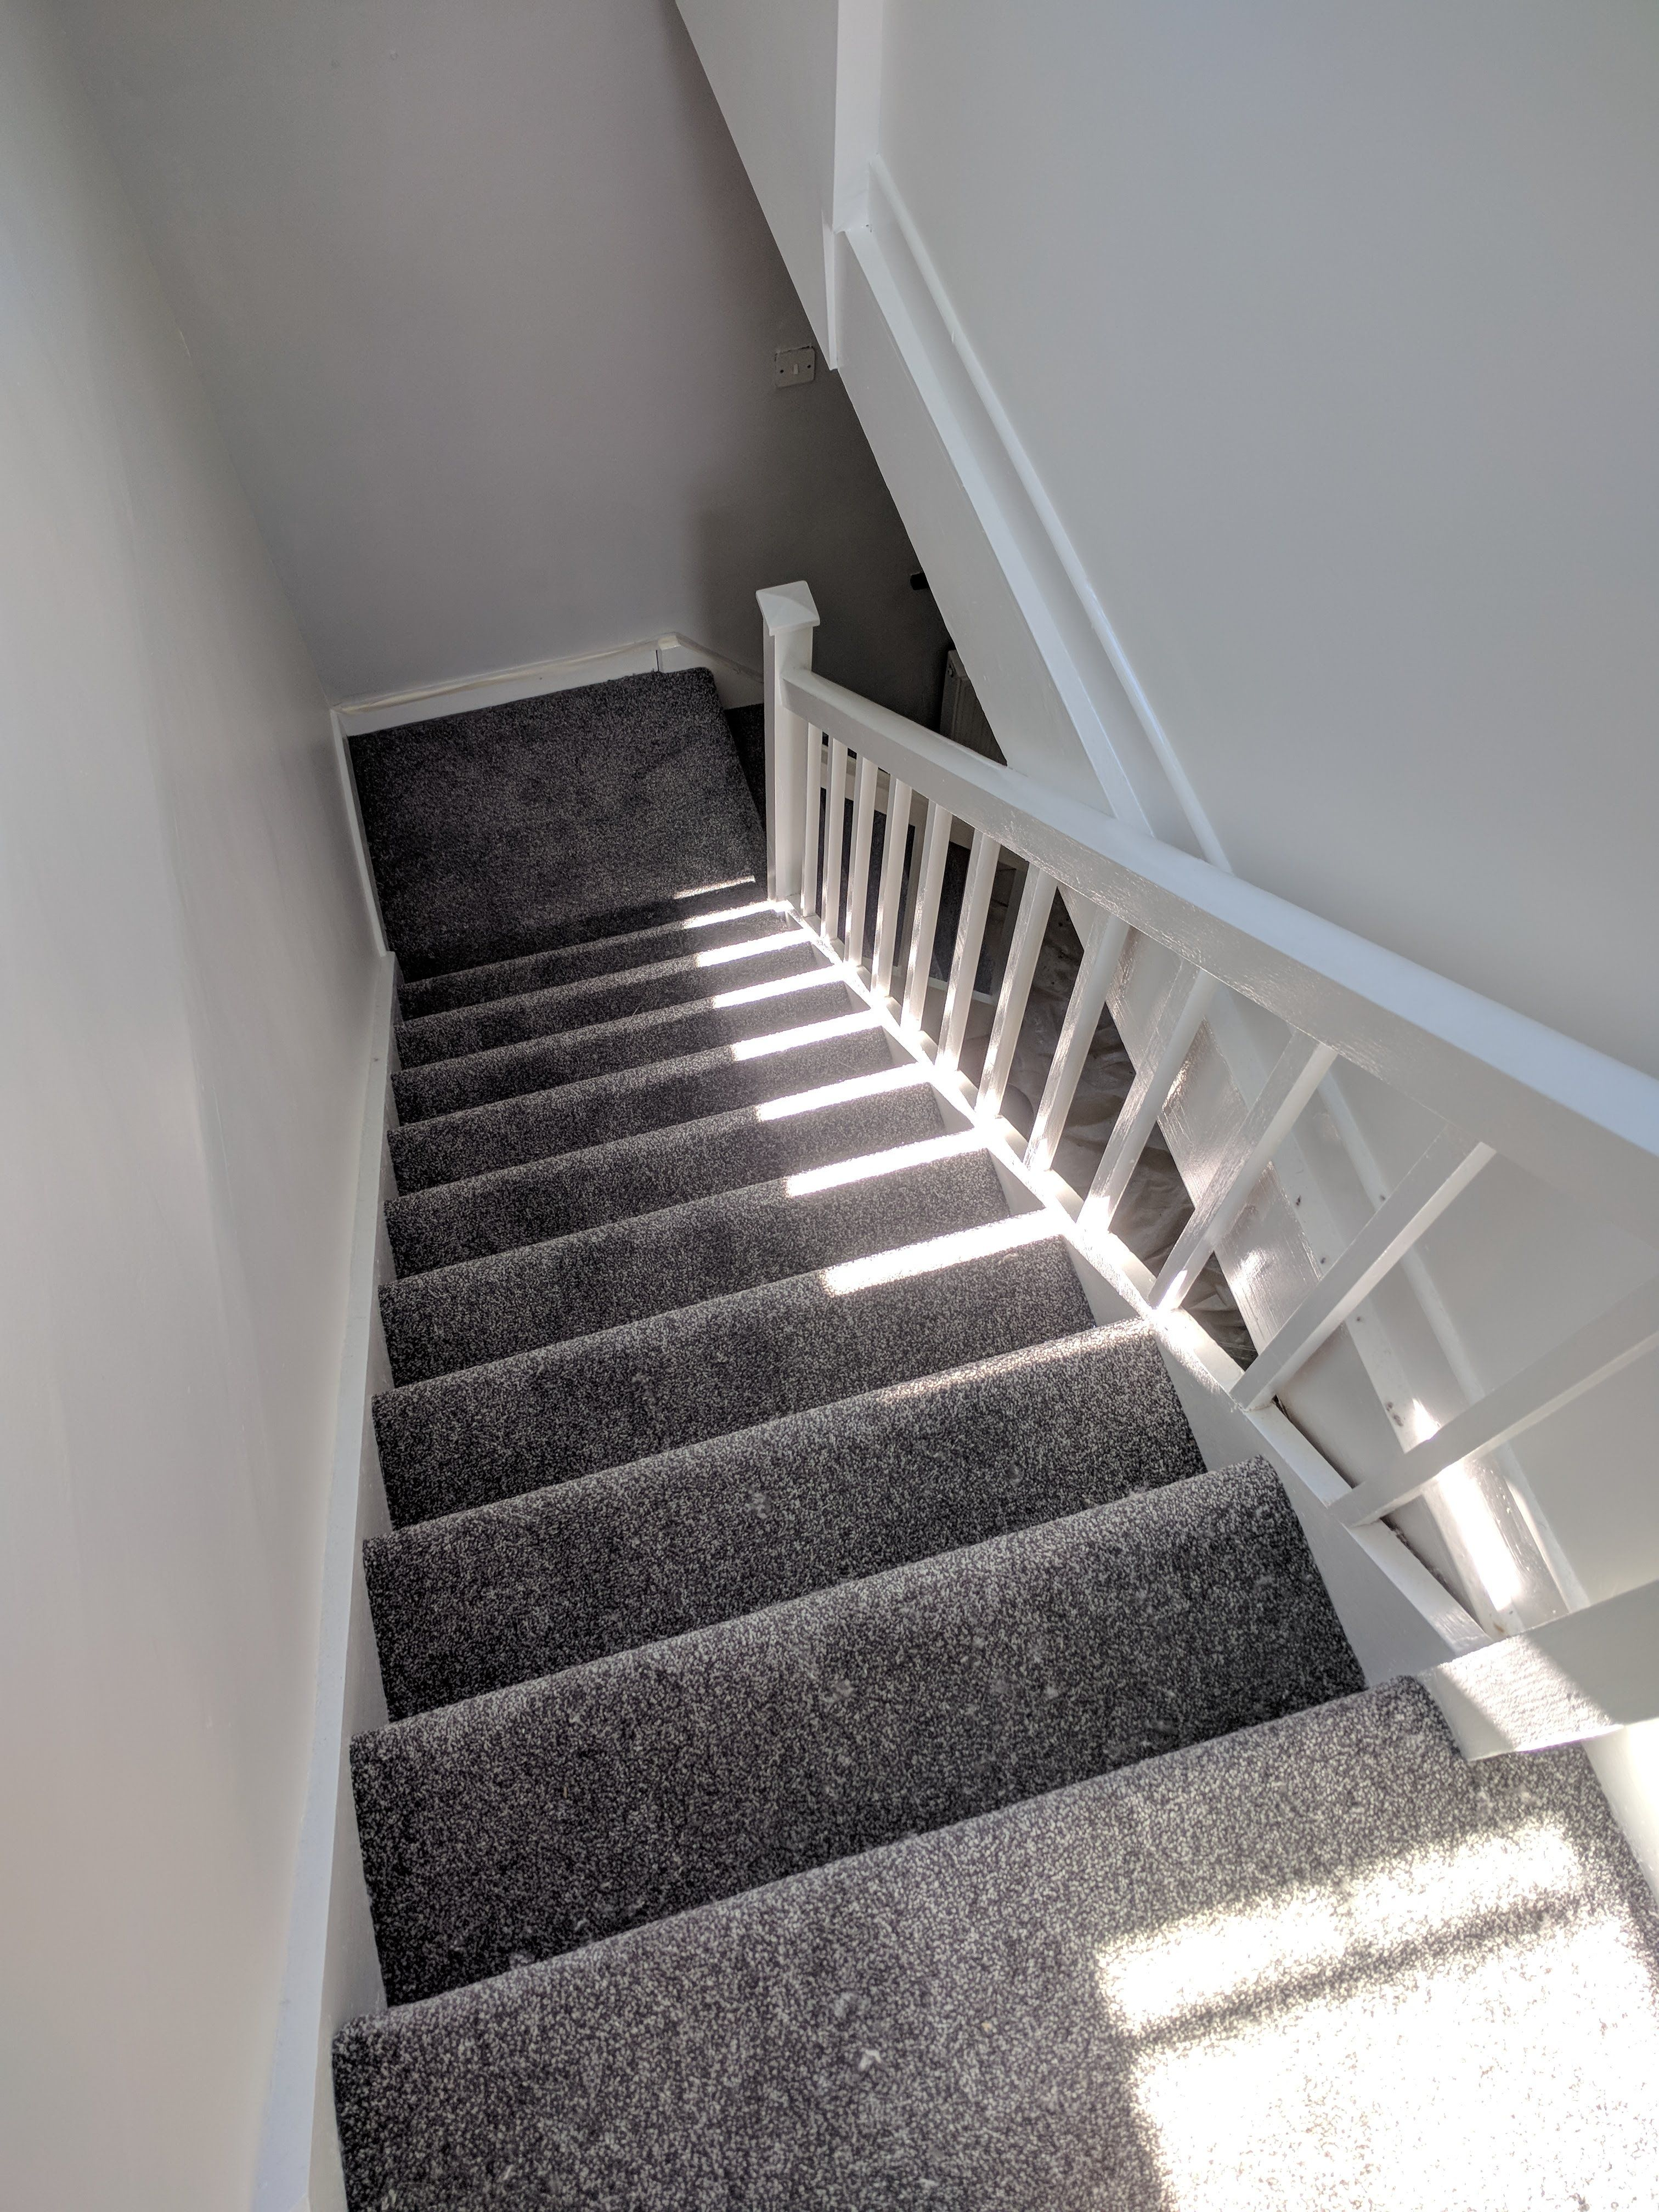 Dark Grey Carpet Install On Stairs And Landing Grey | Best Carpet For Stairs And Landing